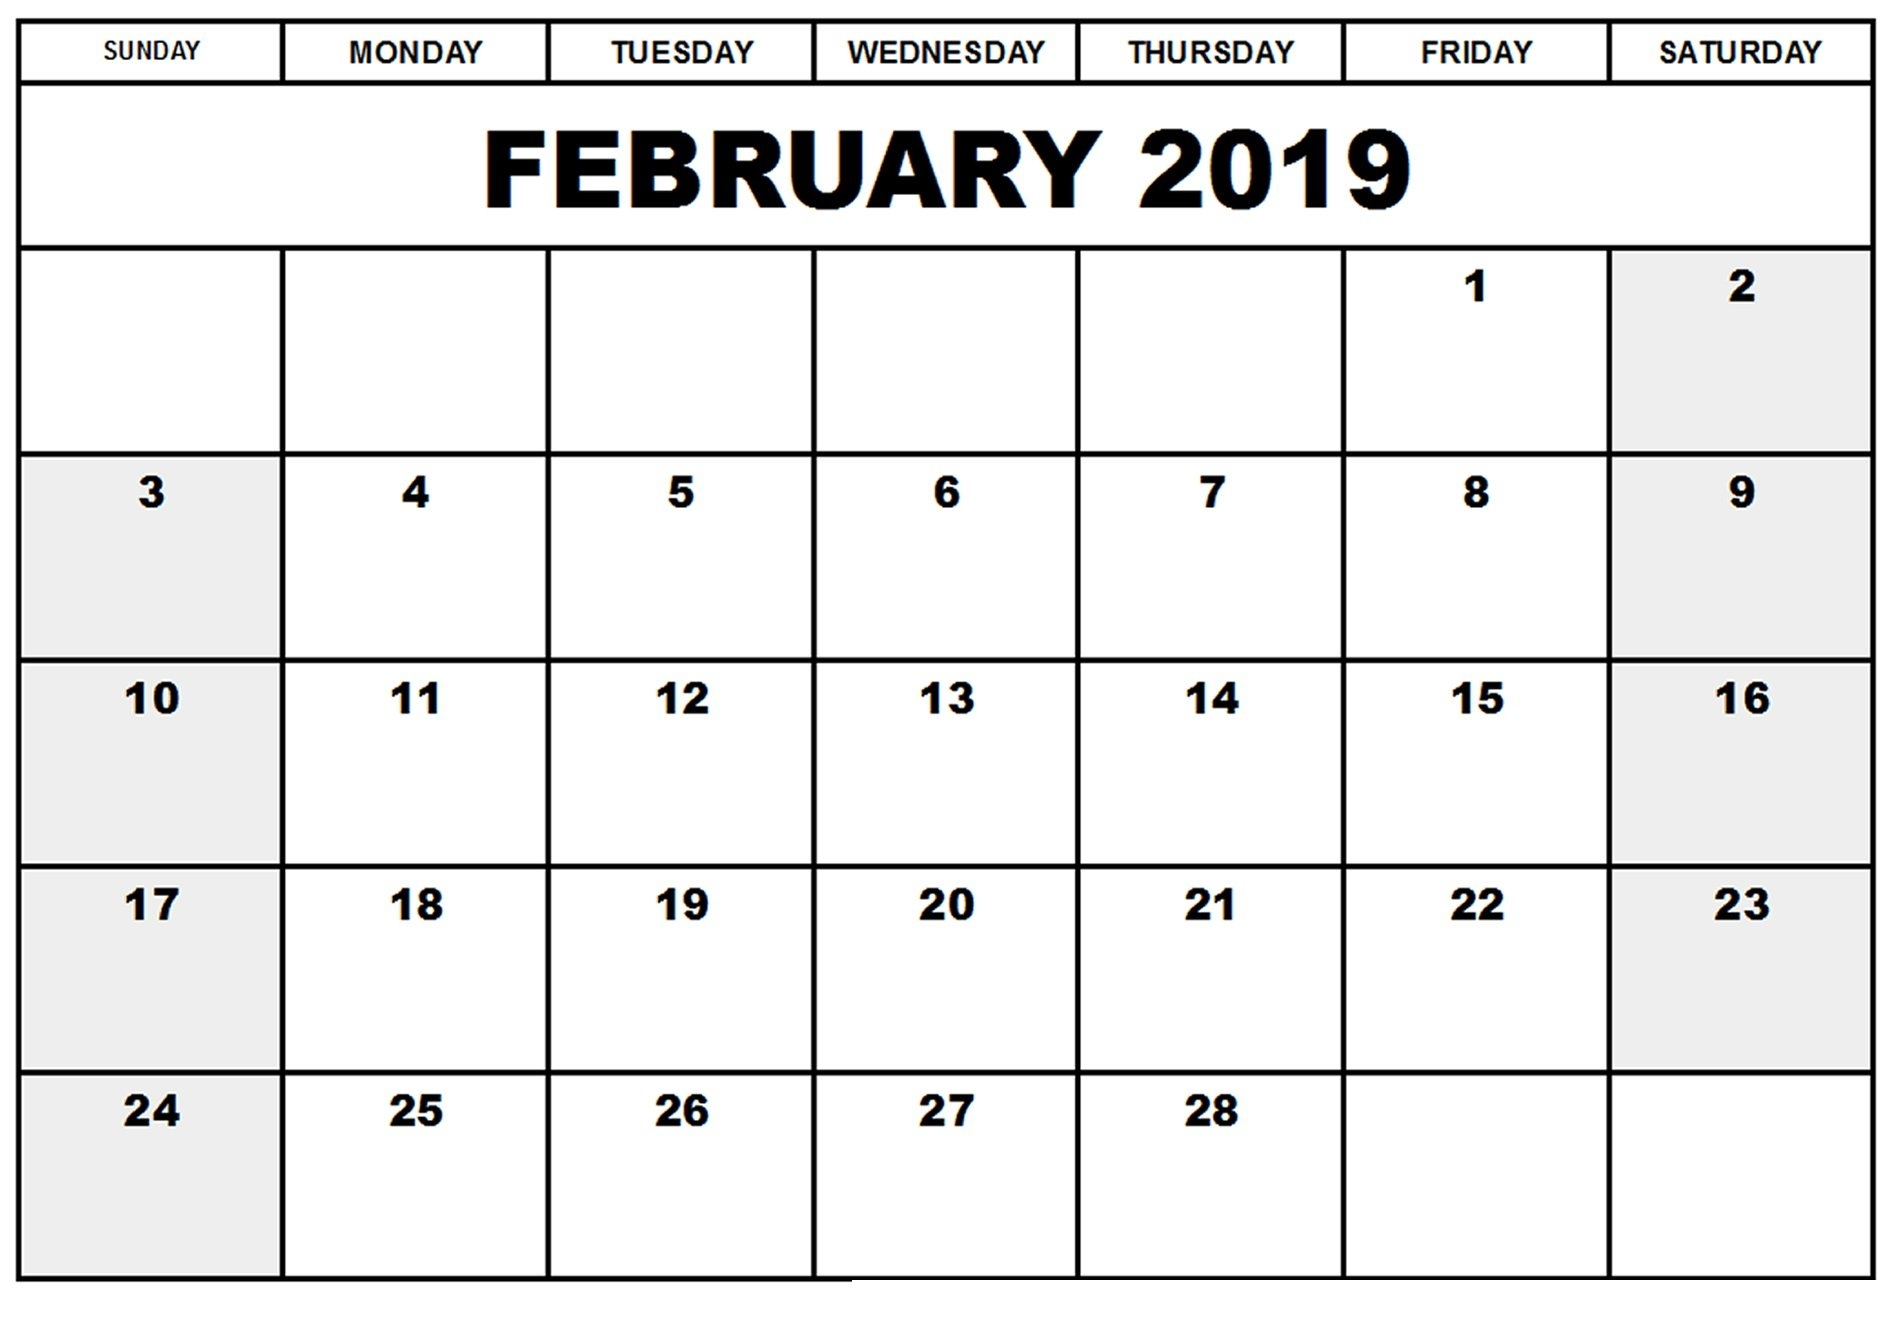 Free Blank A4 February 2019 Calendar Pdf, Excel, Word | Template Calendar 2019 Download Word